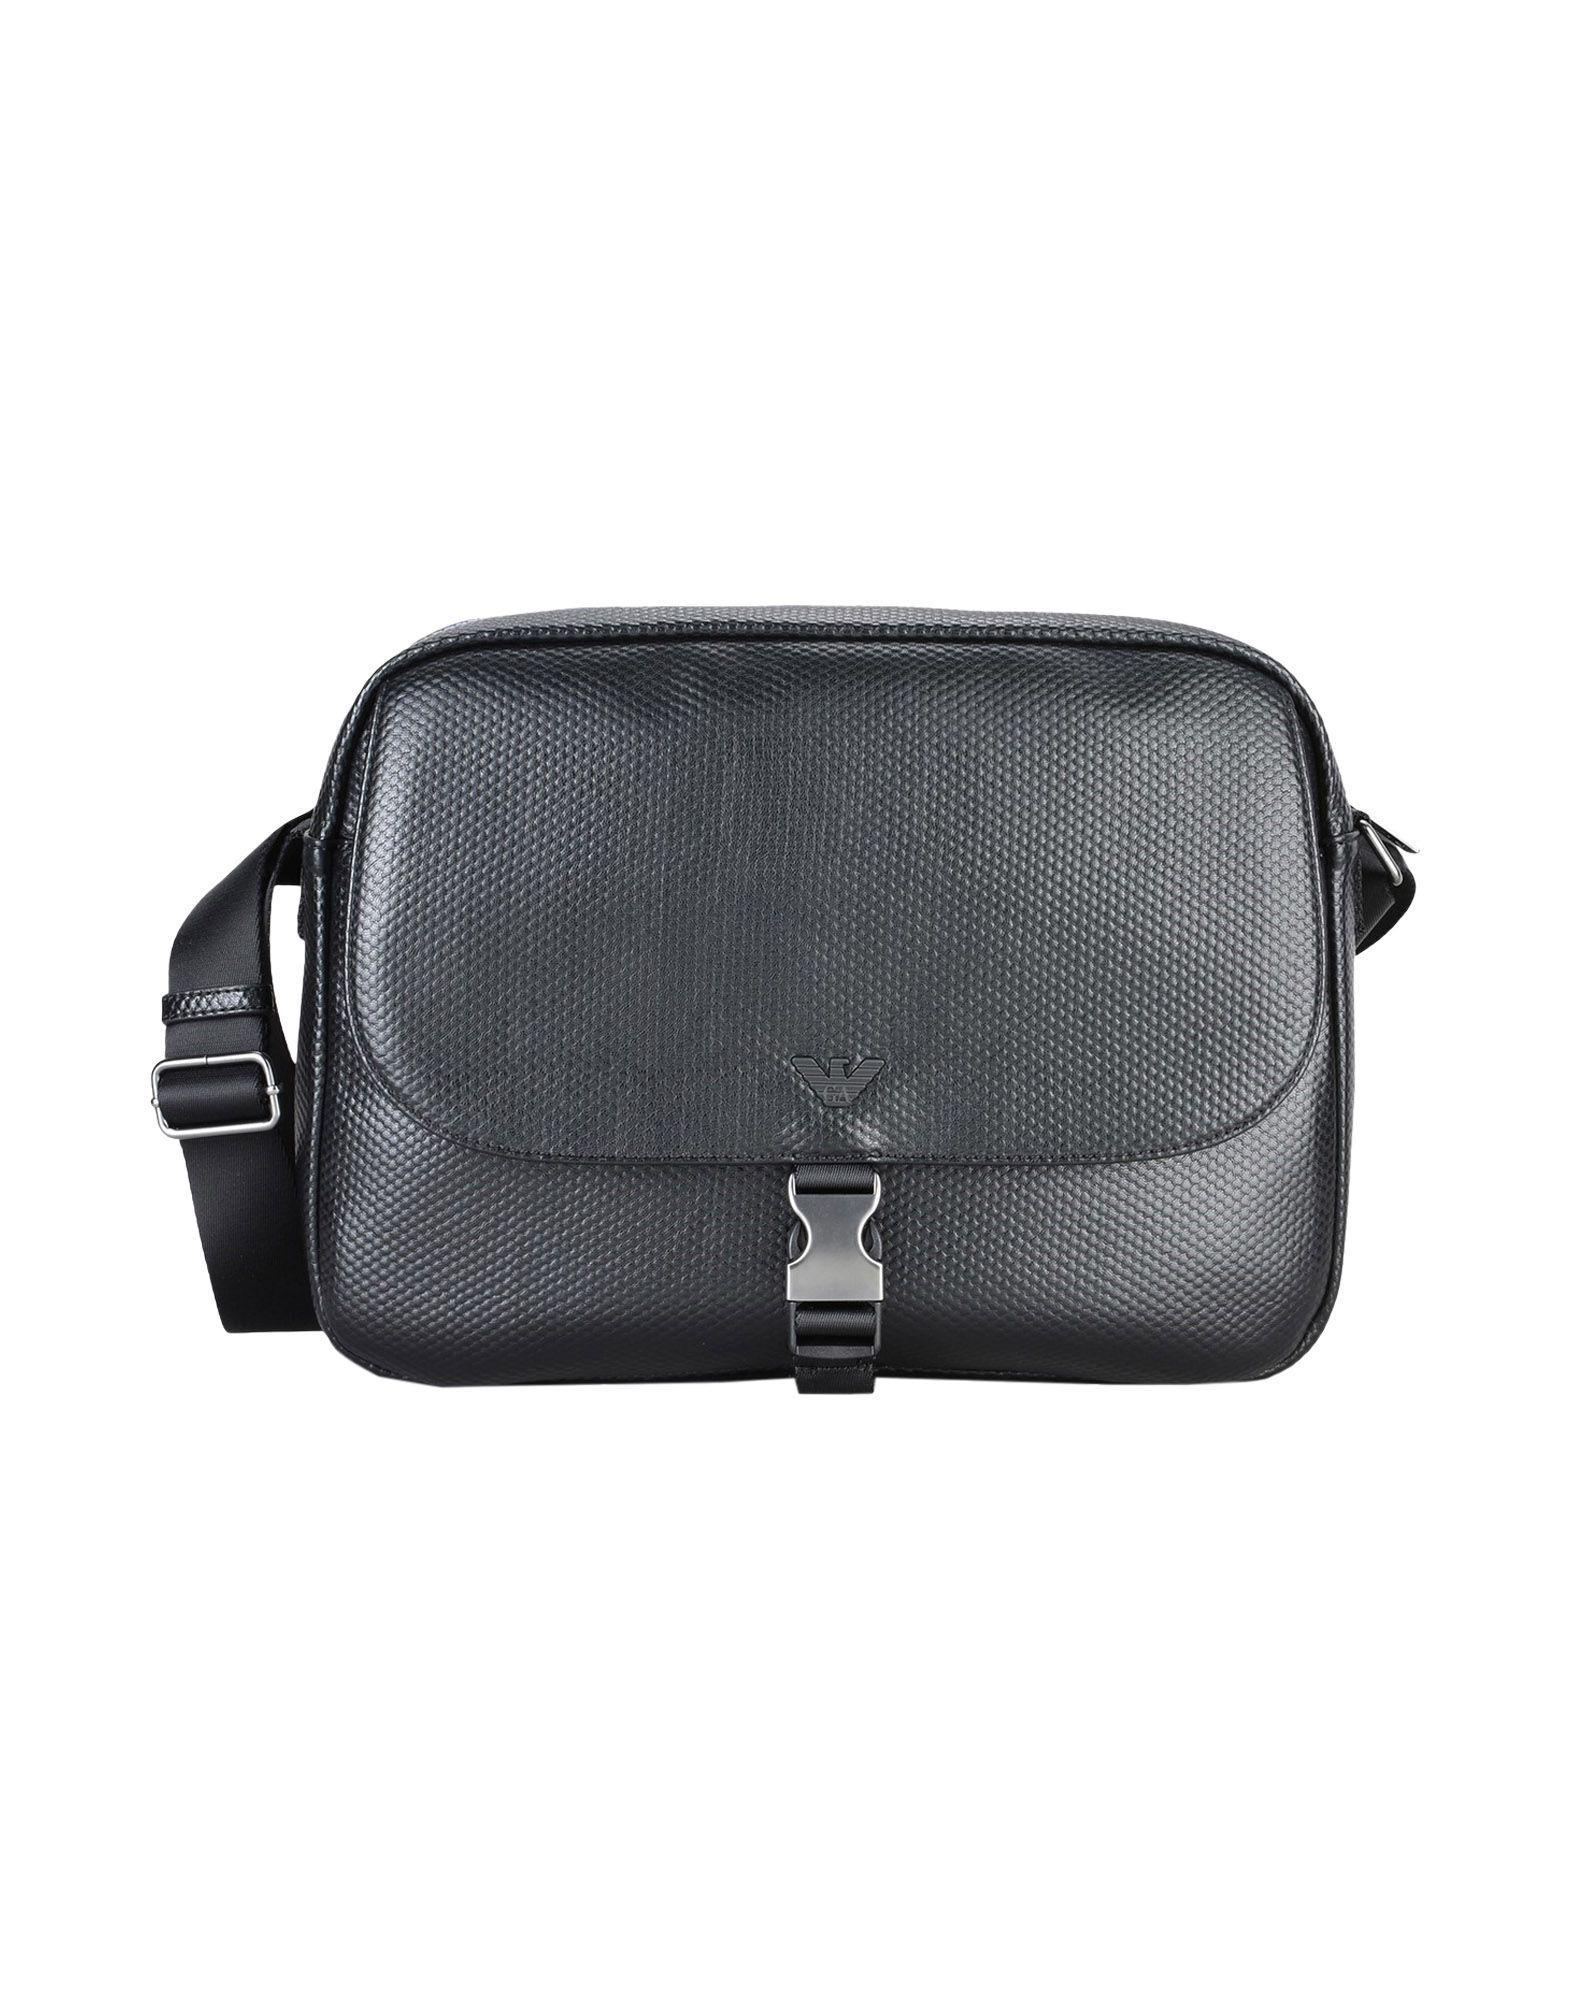 bcc94899390 Armani Jeans Handbags in Black for Men - Lyst